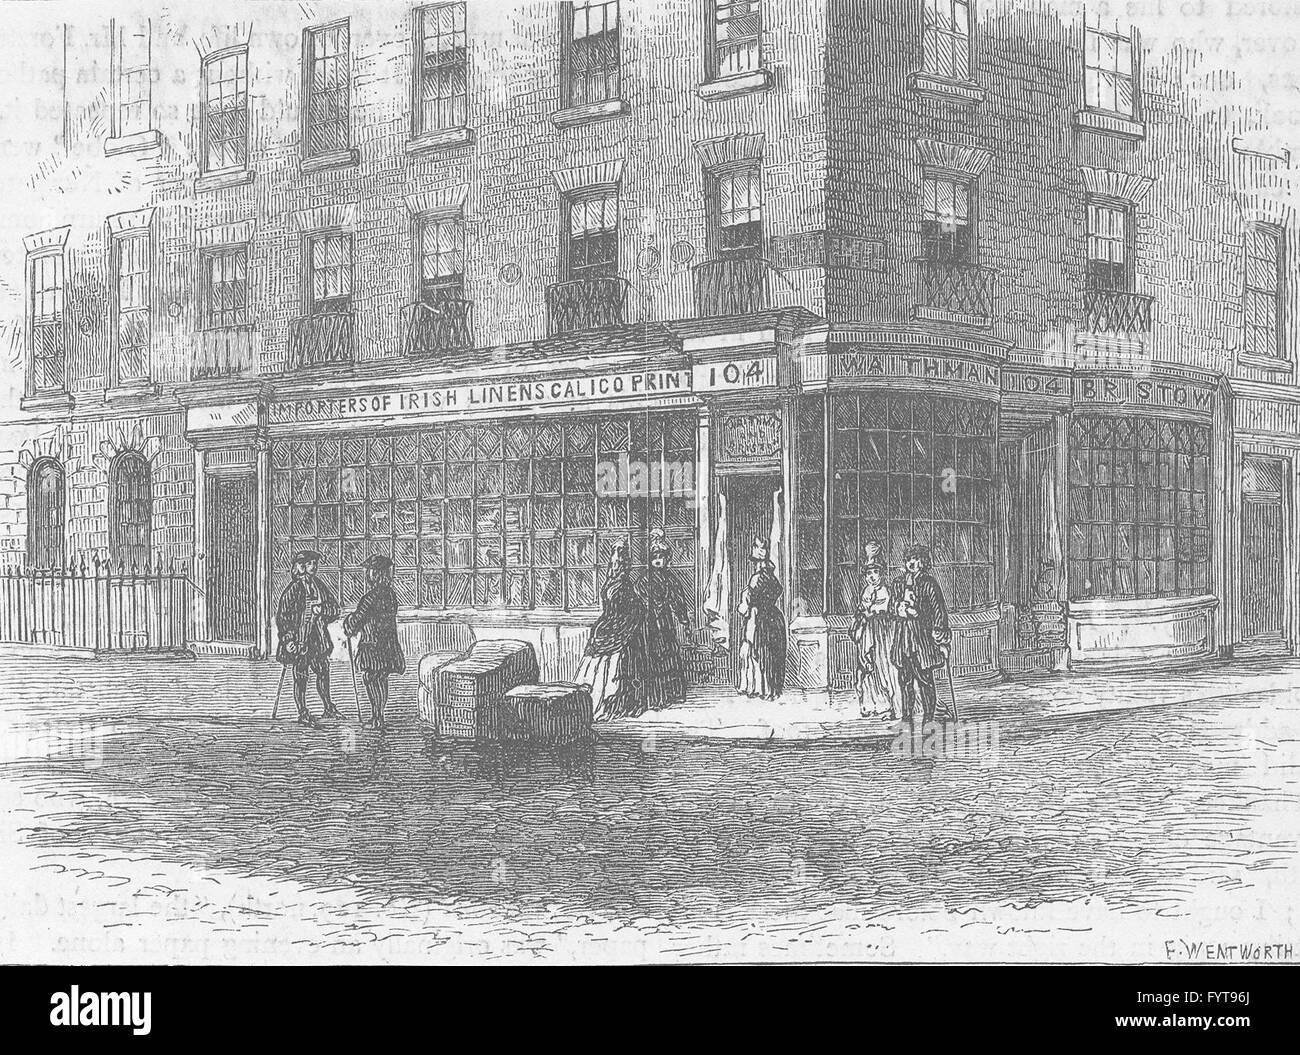 FLEET STREET: Waithman's shop. London, antique print c1880 - Stock Image